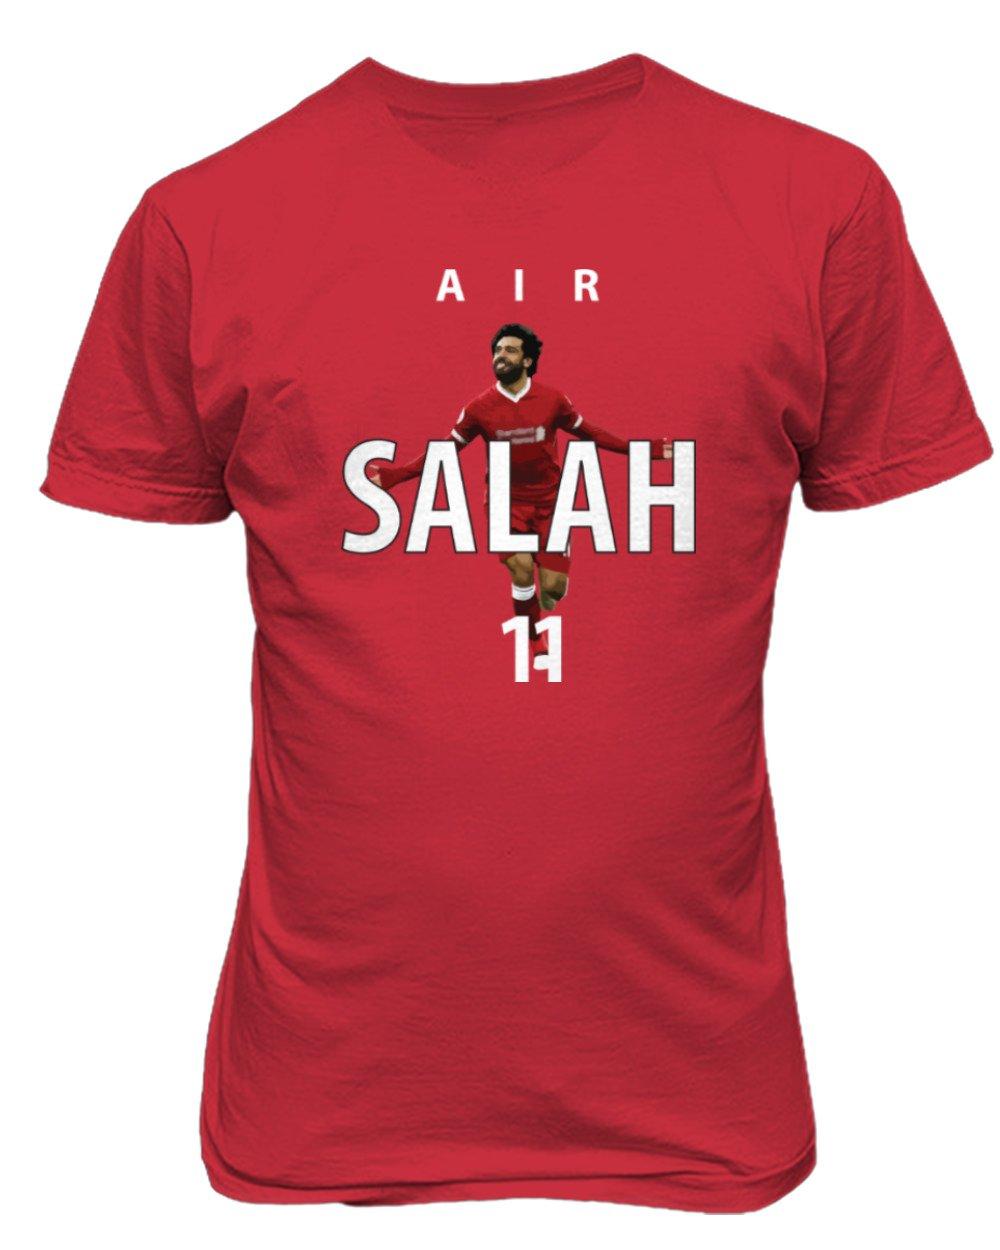 Tcamp Soccer Liverpool Air Salah 11 Mohamed Salah T Shirt 2840